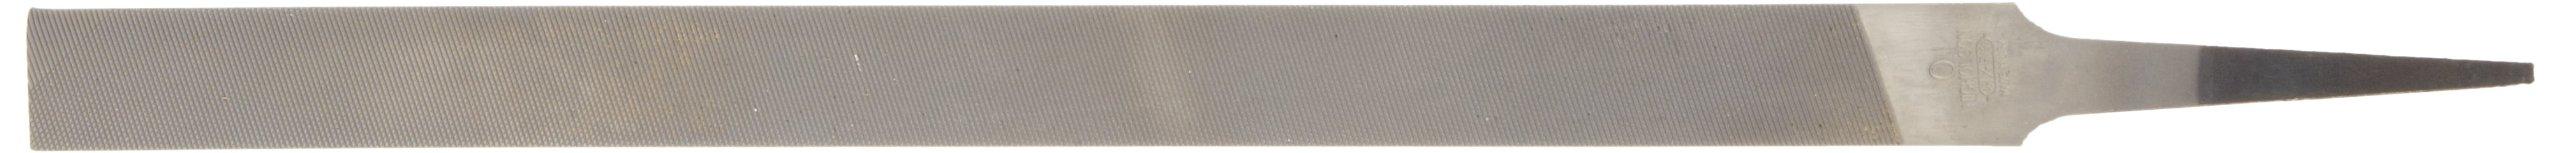 Nicholson Pillar File, Swiss Pattern, Double Cut, Rectangular, #0 Coarseness, 10'' Length